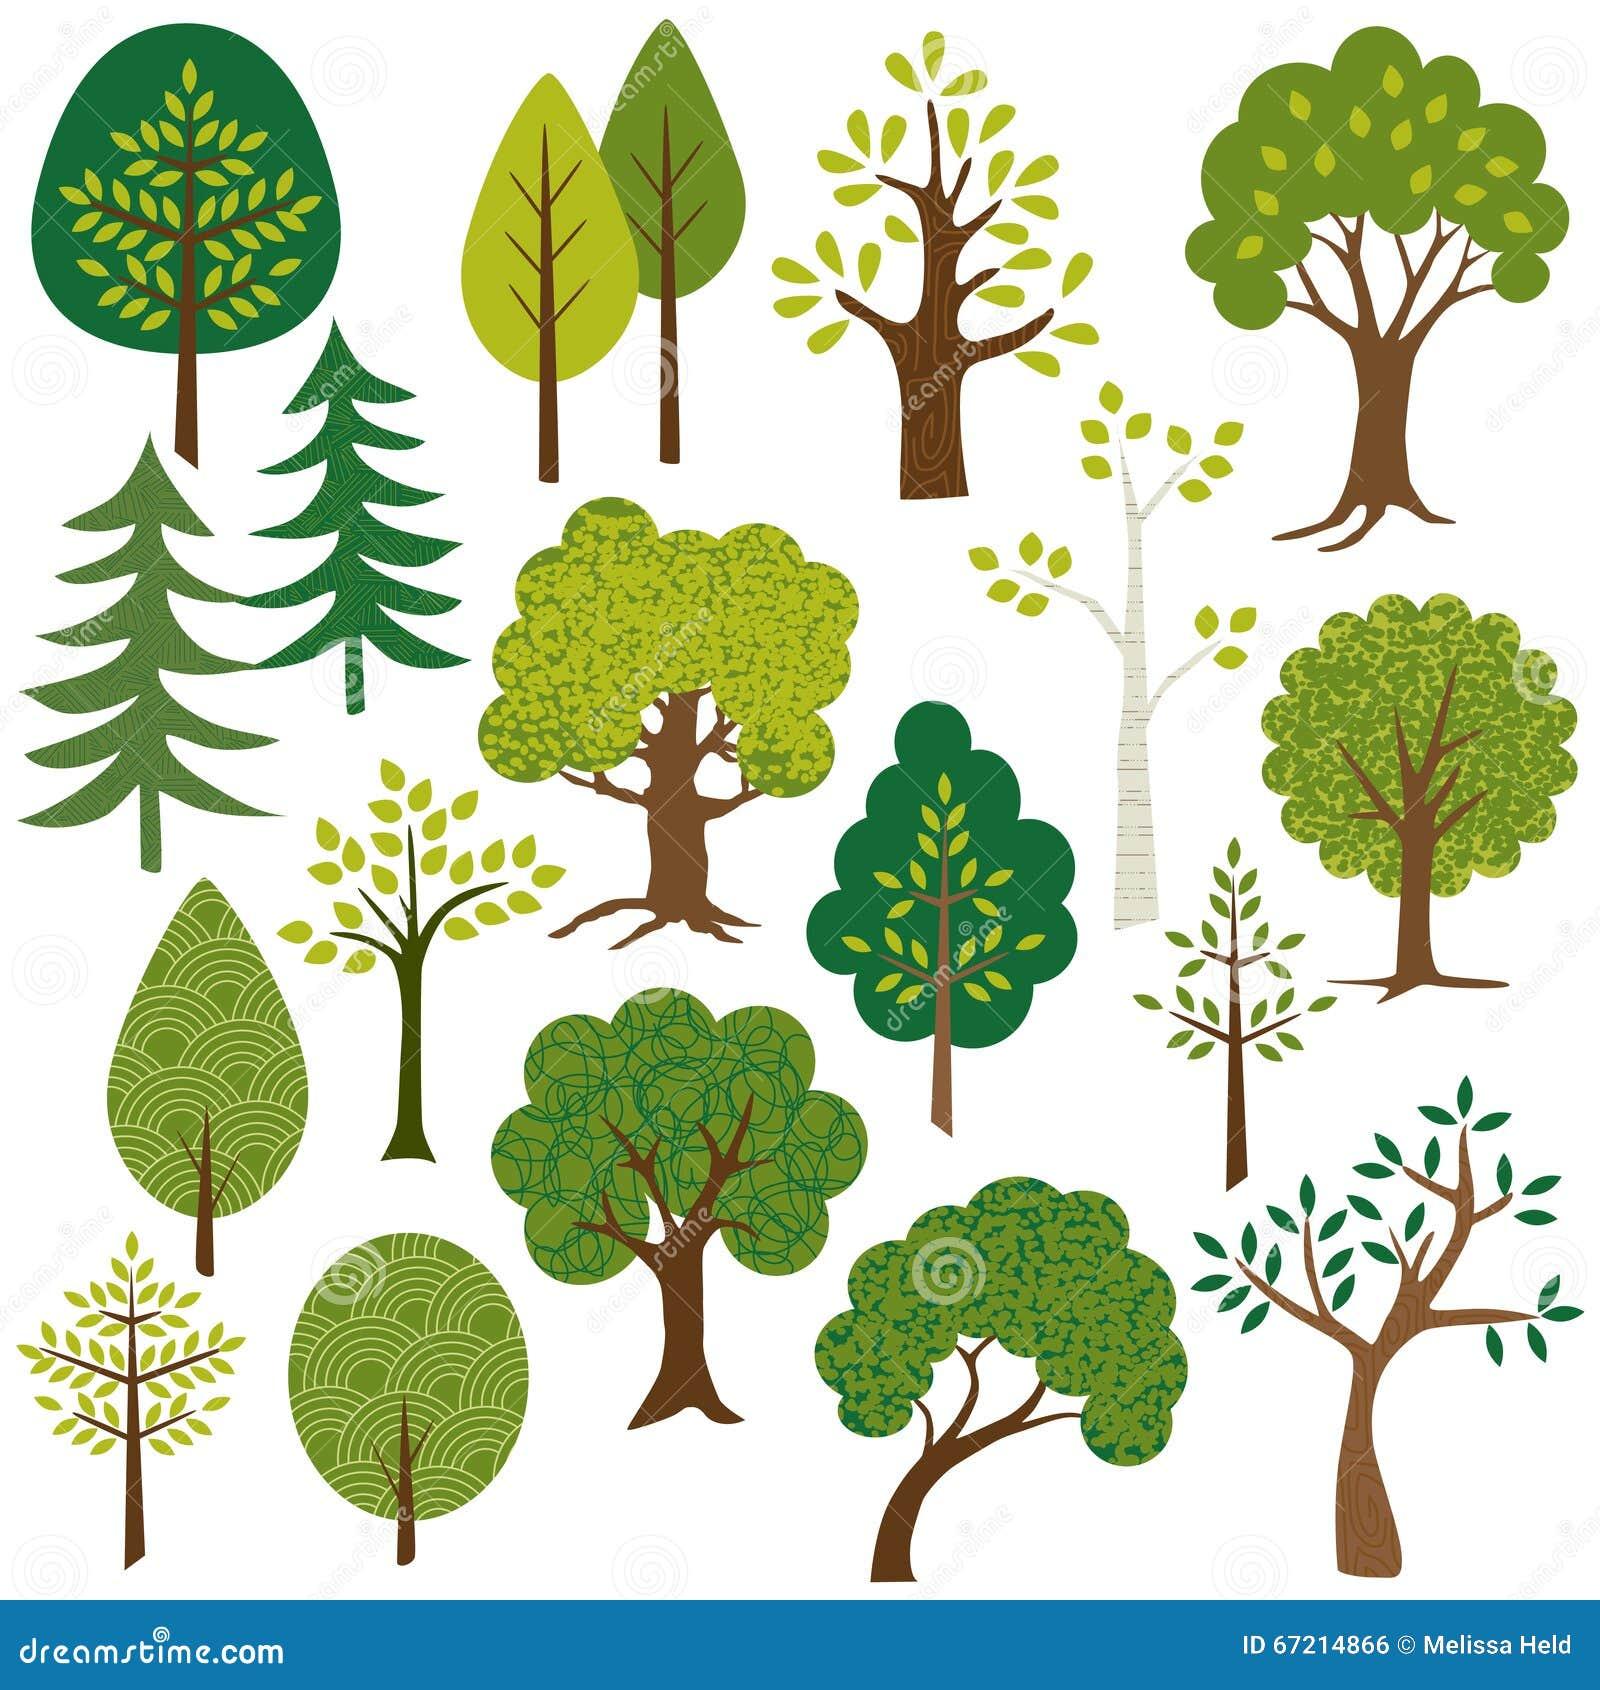 Baum Clip Art Herbst Bilder Gratis Pictures to pin on